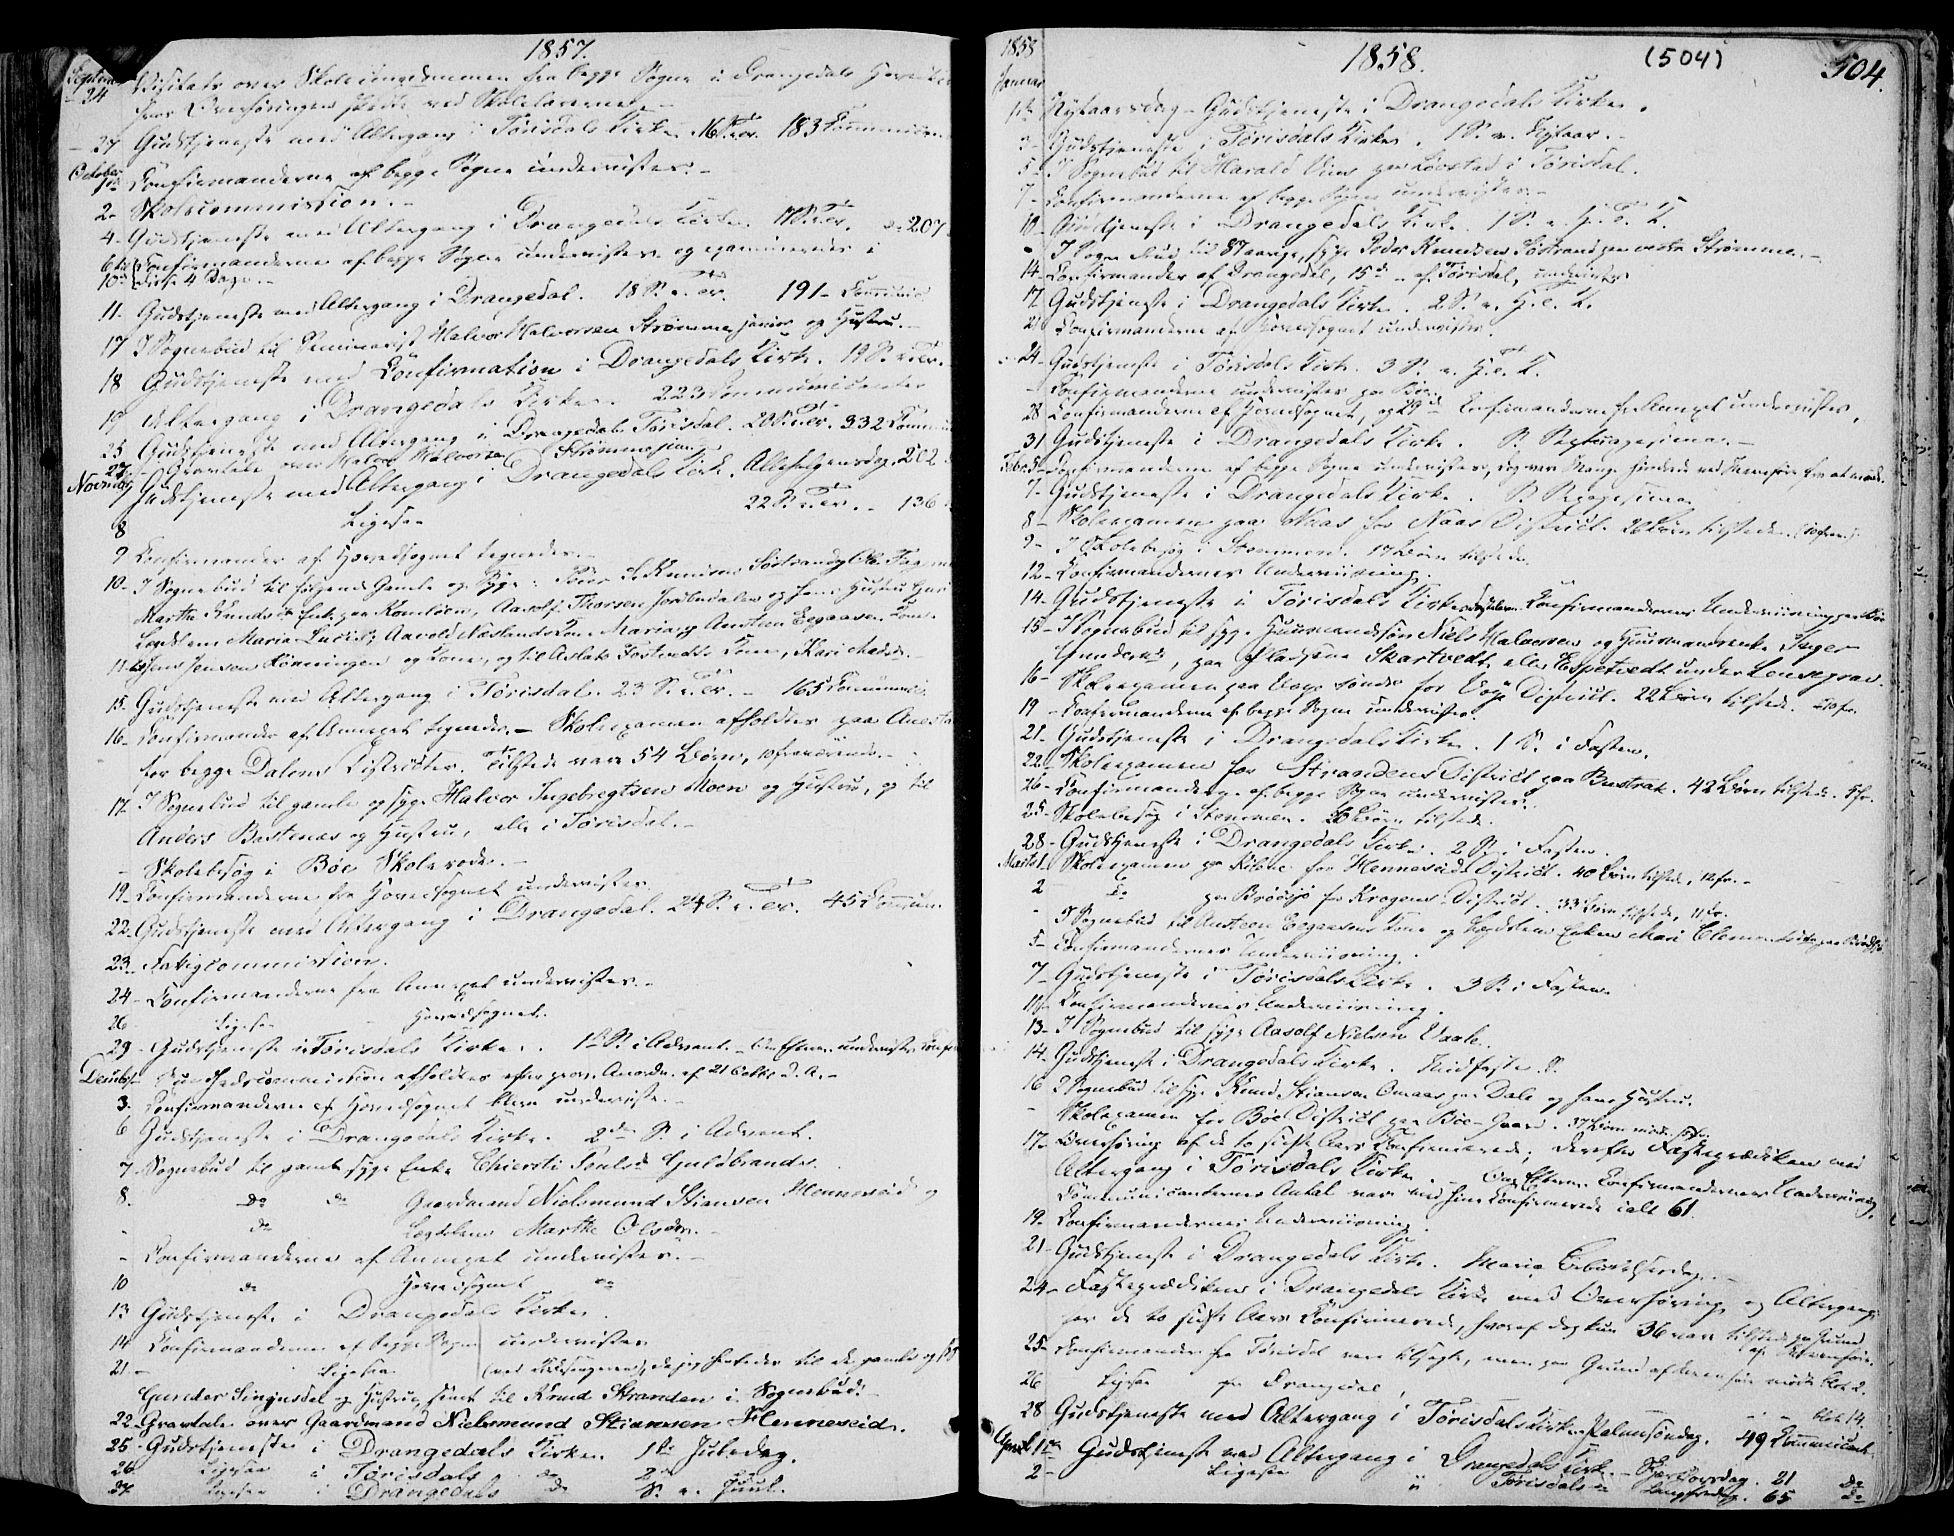 SAKO, Drangedal kirkebøker, F/Fa/L0008: Ministerialbok nr. 8, 1857-1871, s. 504